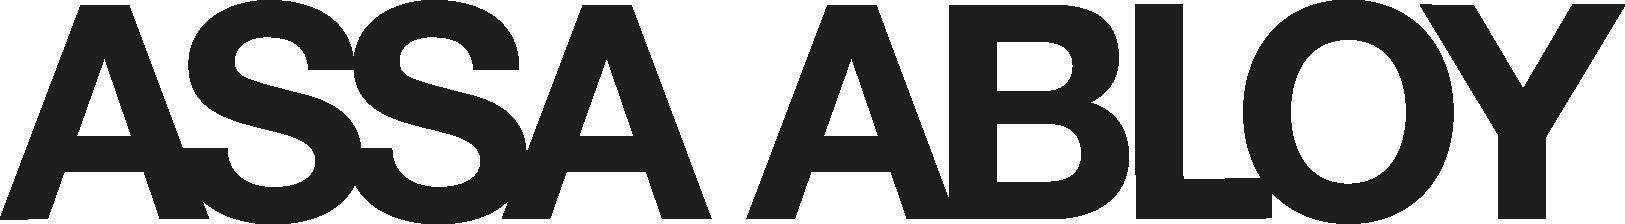 Assa-Abbloy